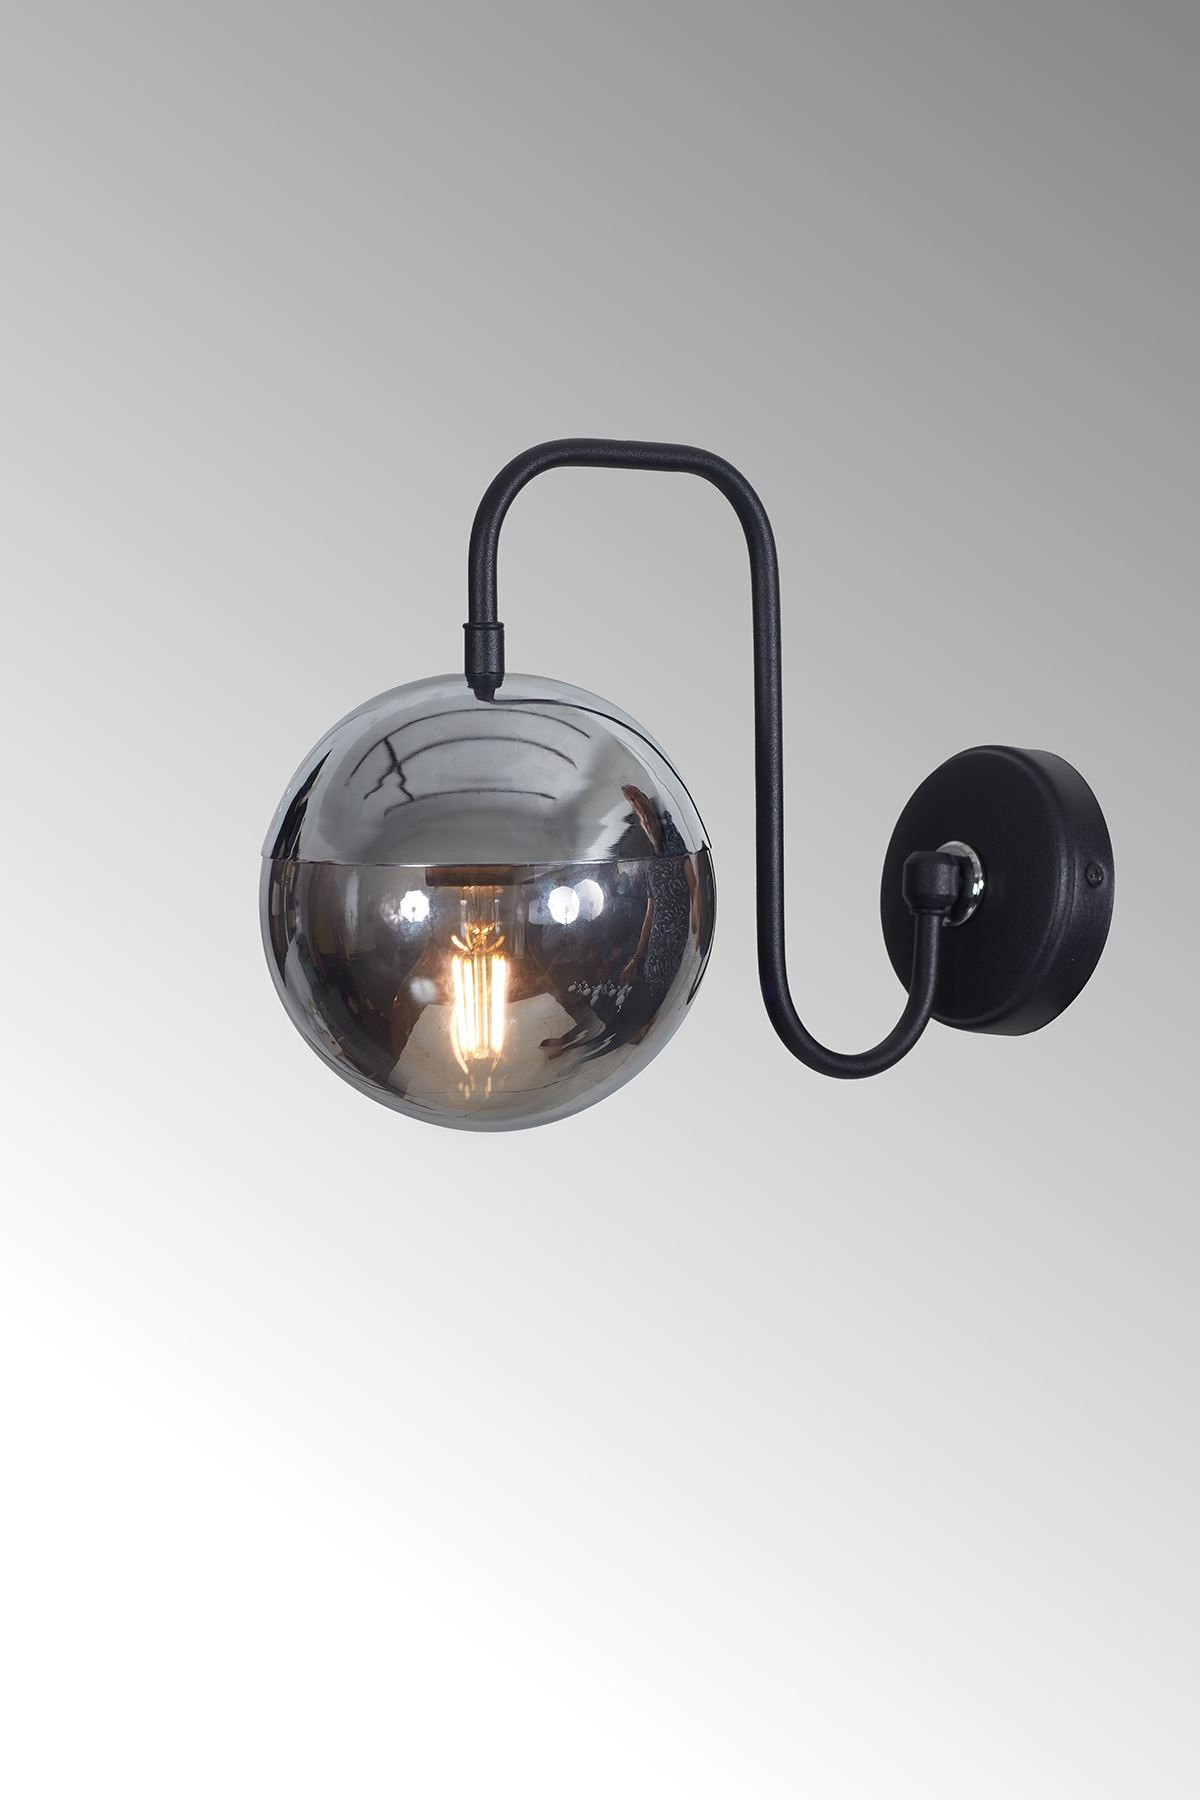 Siesta Krom-Siyah Metal Gövde Füme Camlı Tasarım Lüx Aplik